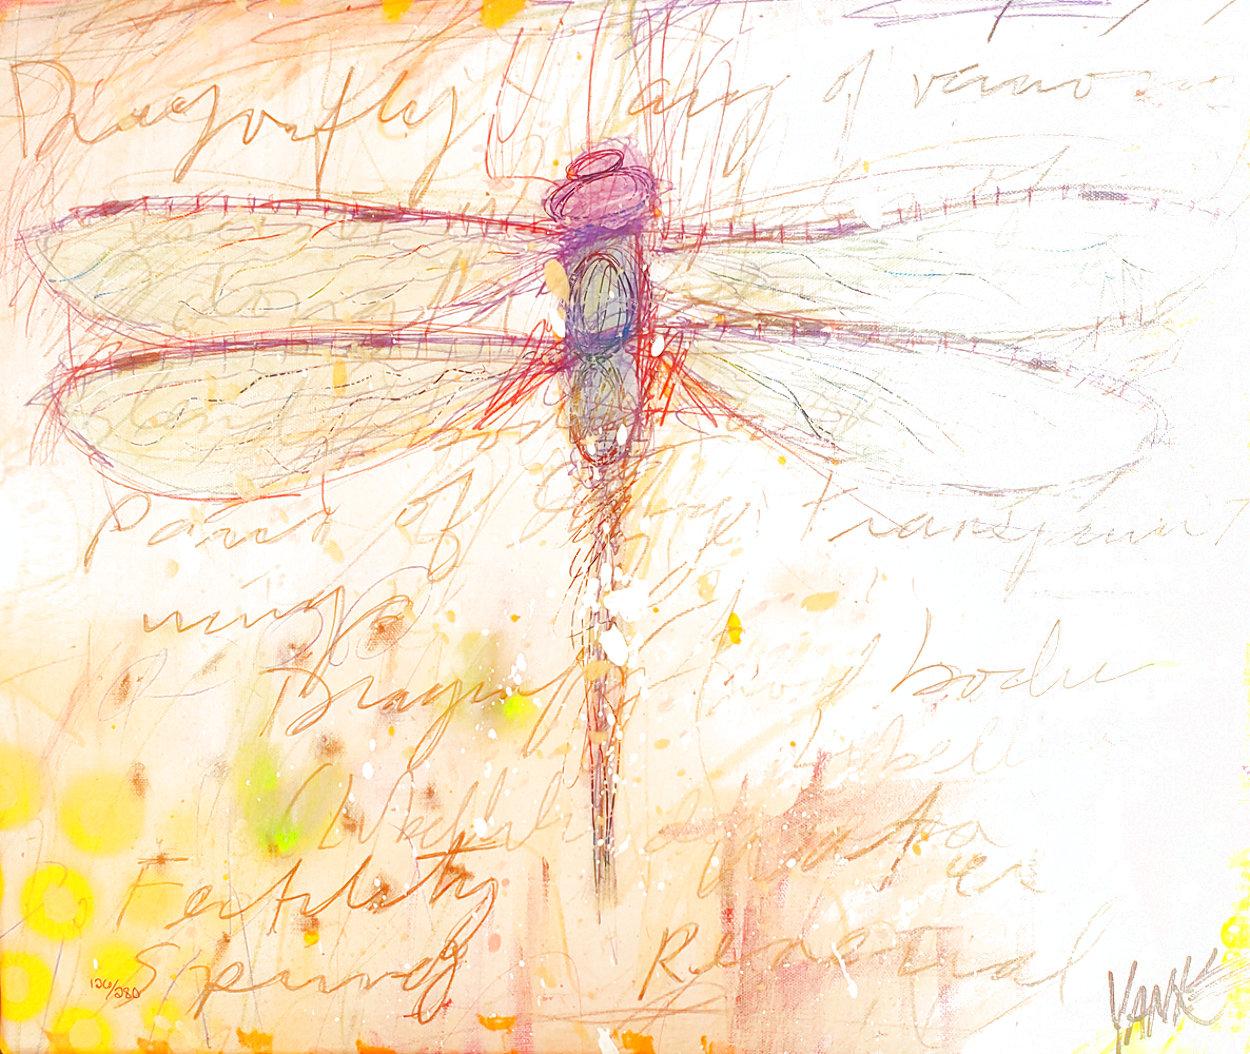 Dragonfly I 2011 Limited Edition Print by Tim Yanke